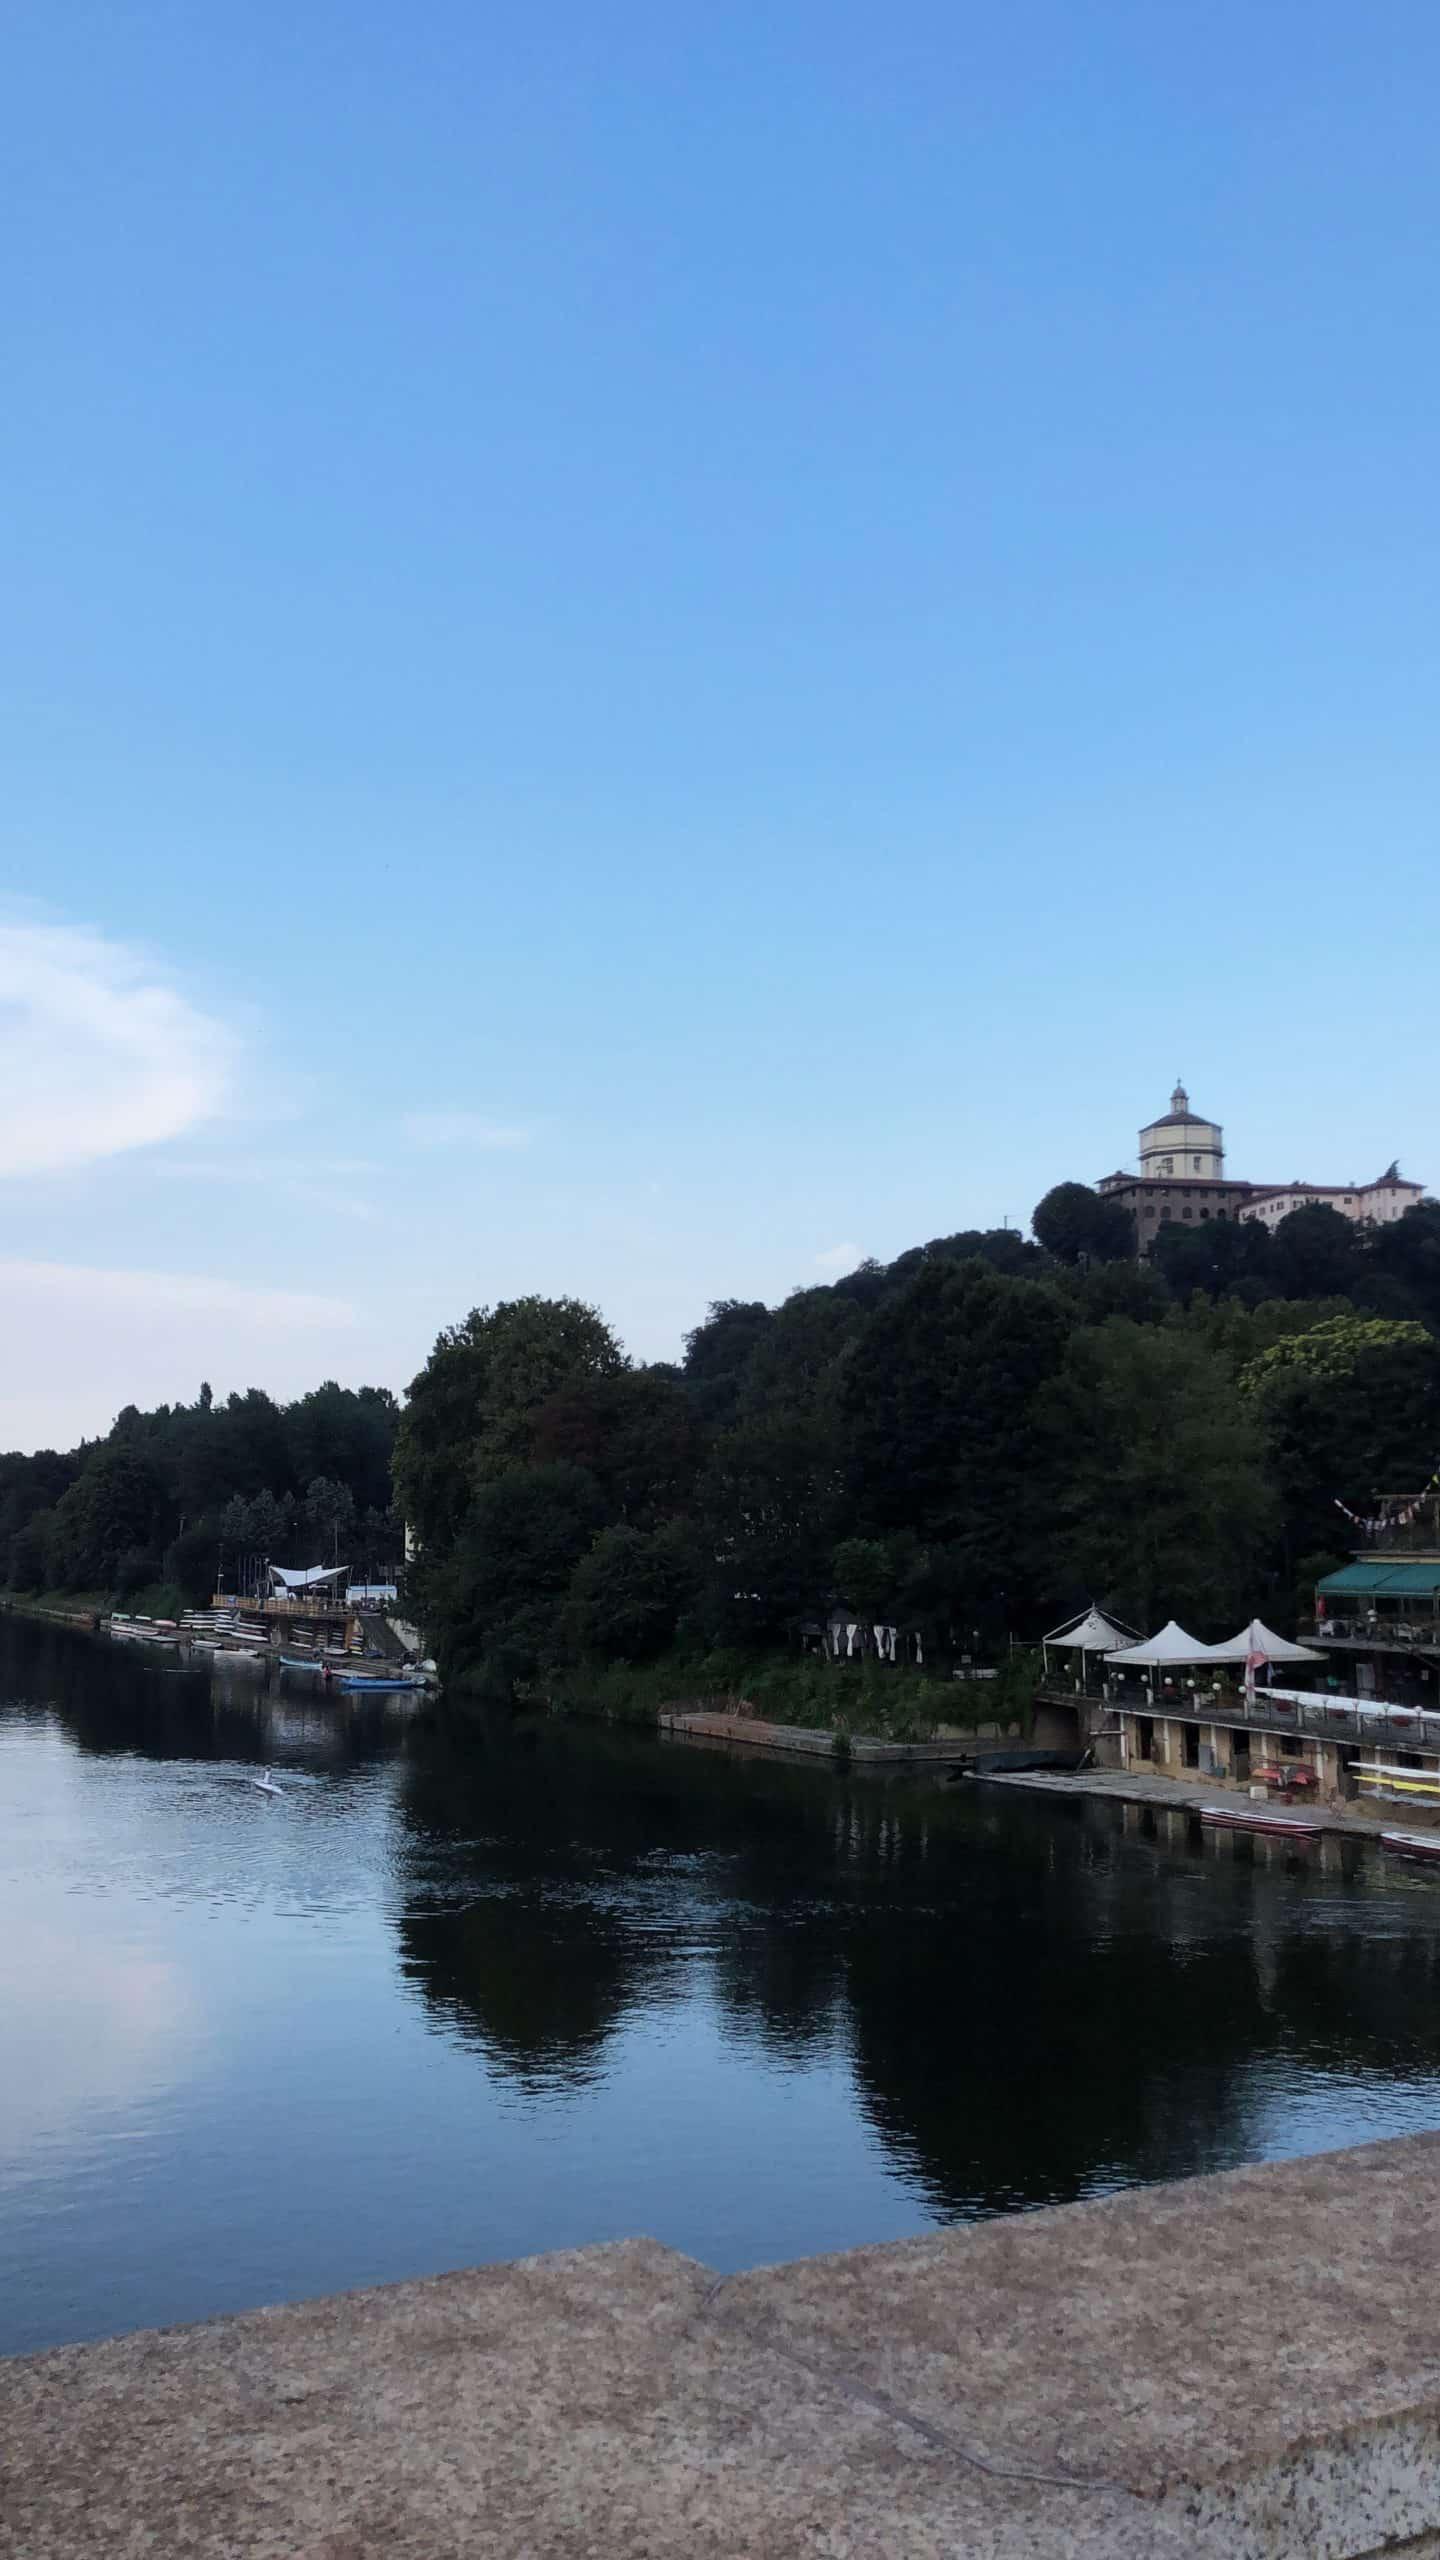 2 days in Turin